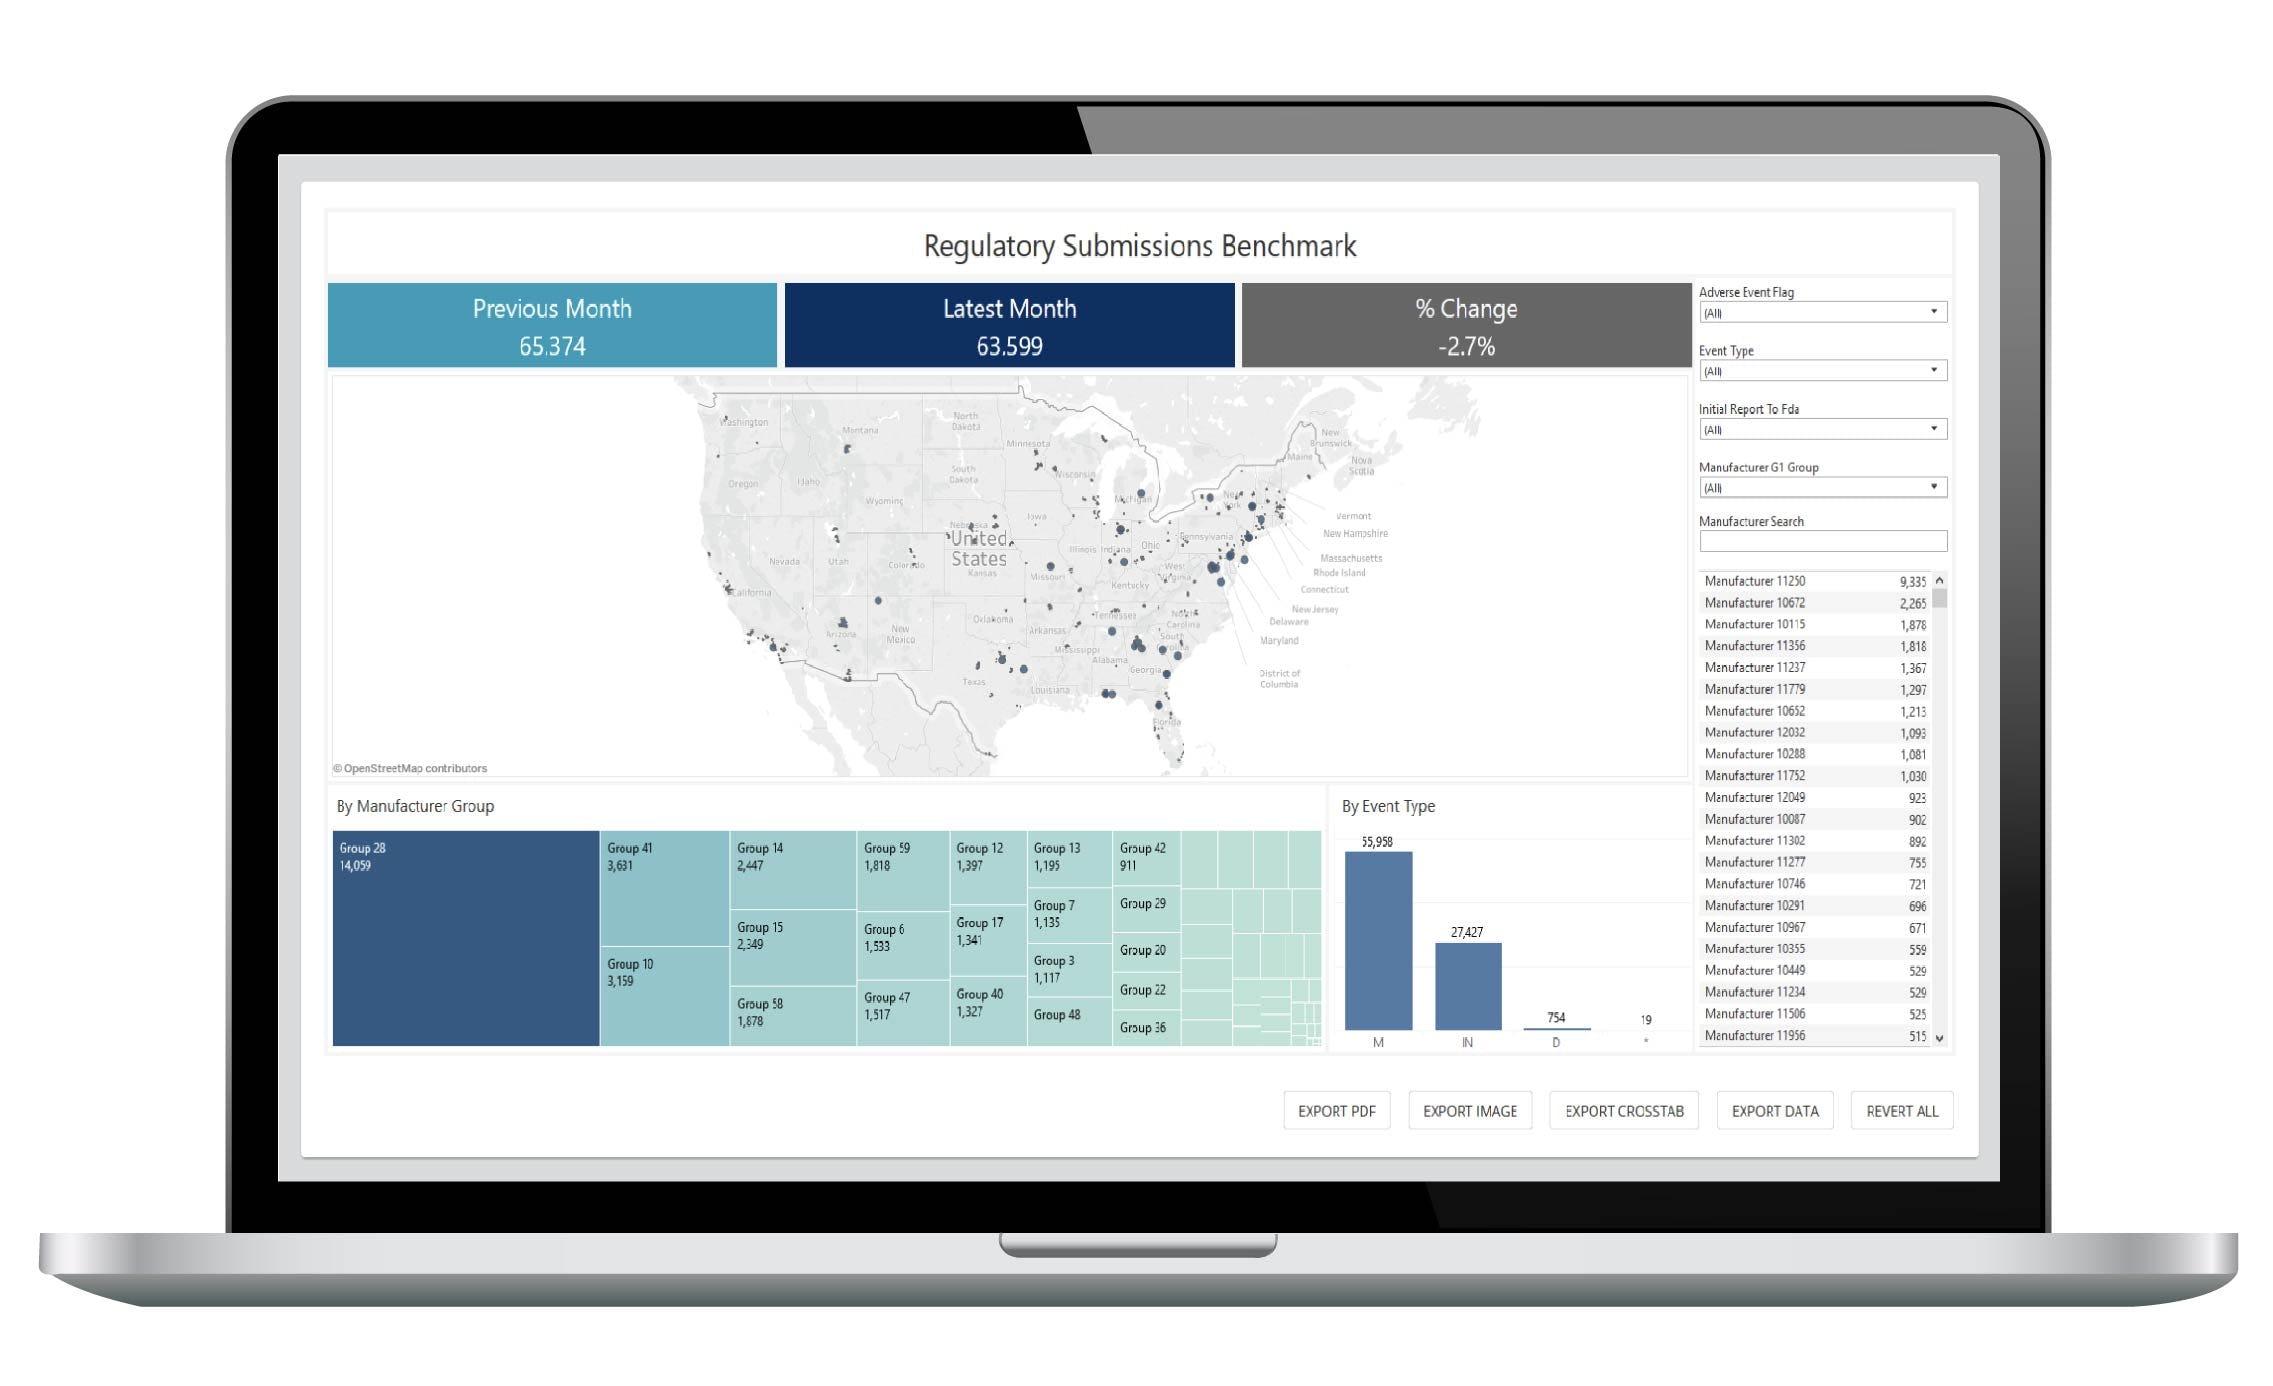 ETQ Reliance Software - ETQ Insights, regulatory dashboard